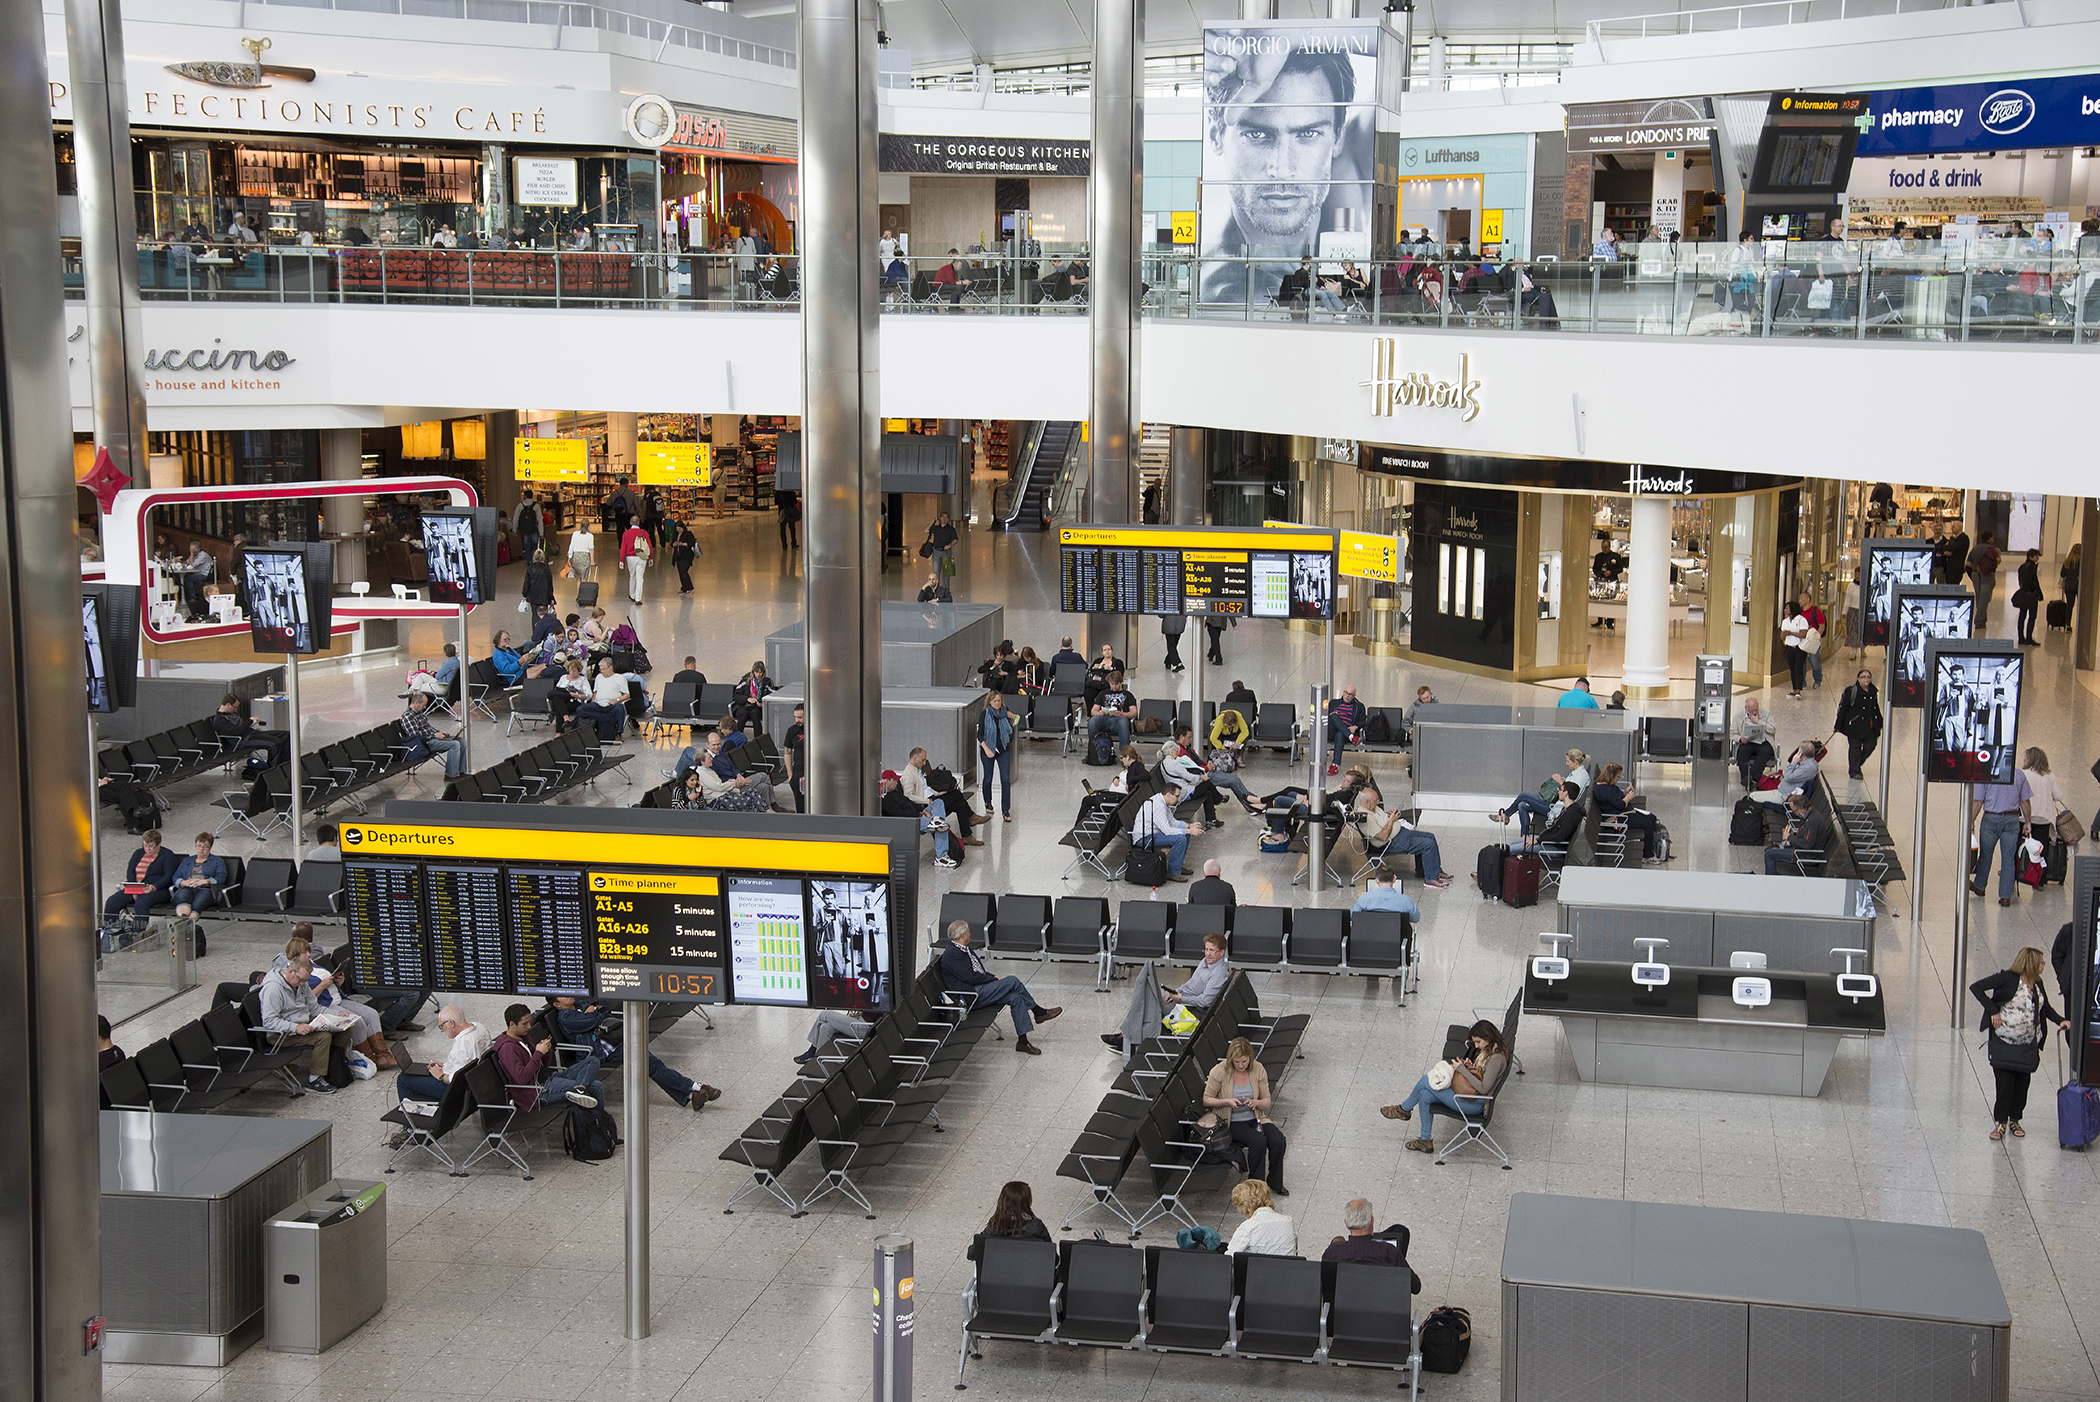 Terminal 2 interior of building at London Heathrow Airport UK.